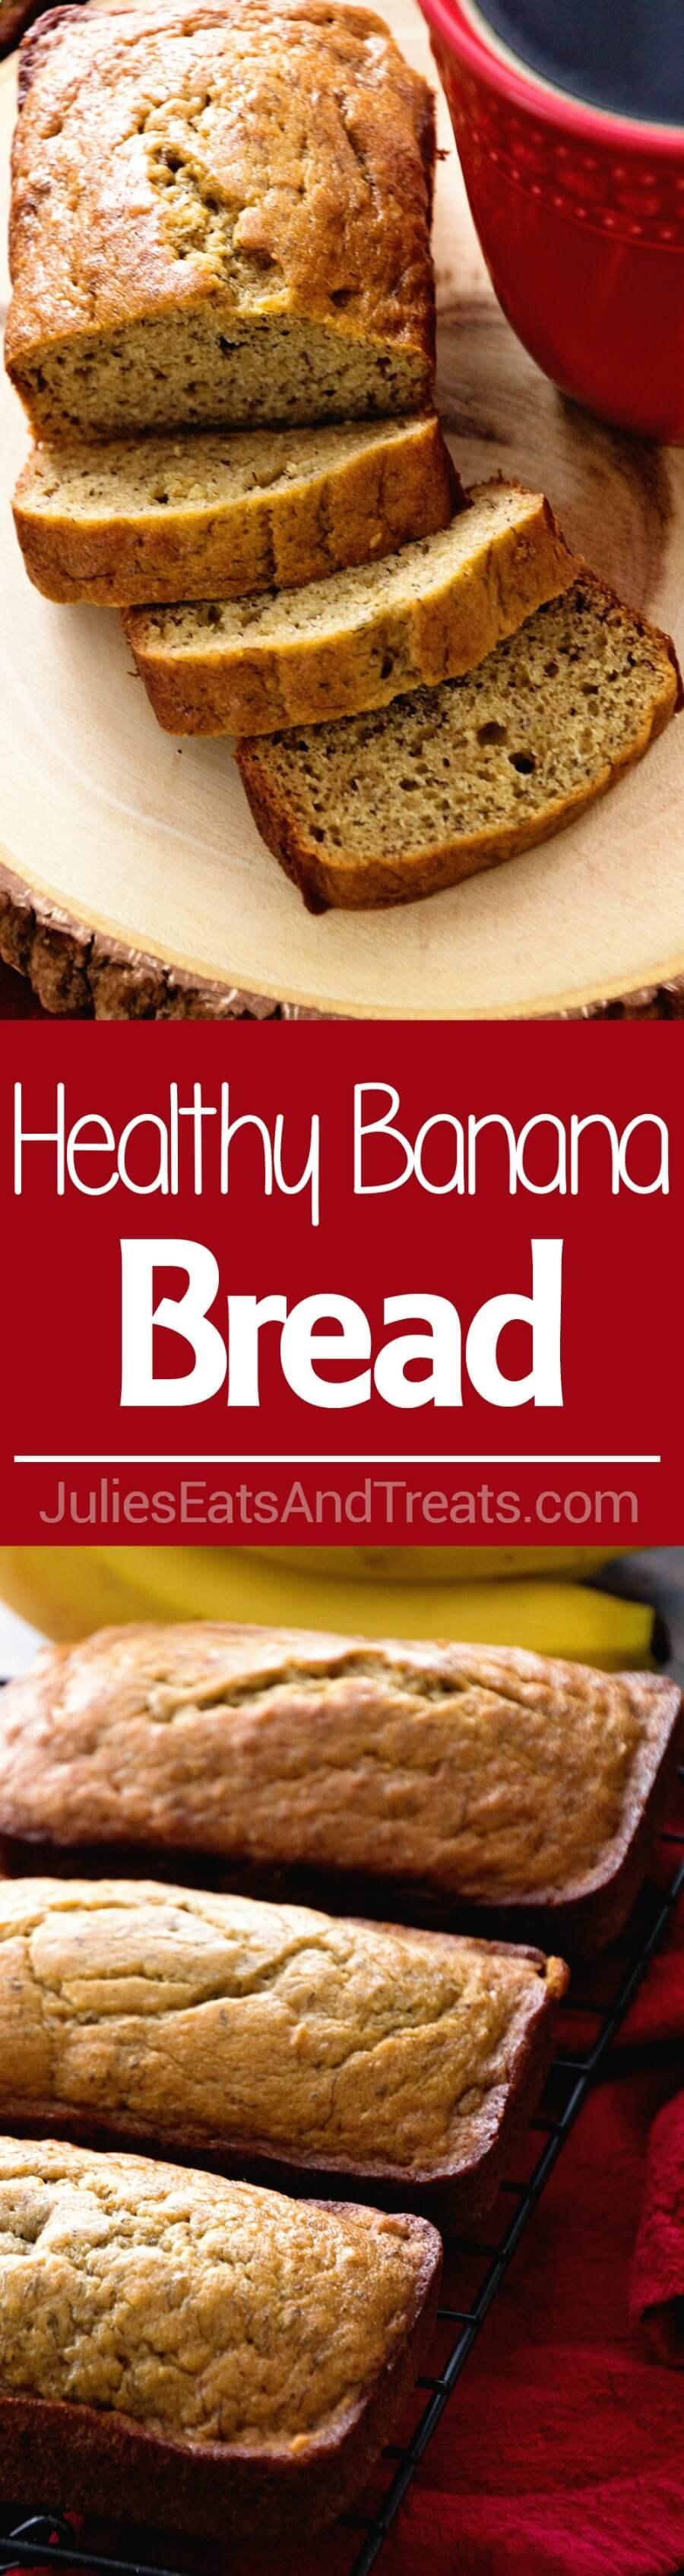 Healthy banana bread recipe delicious mini banana bread loaves healthy banana bread recipe delicious mini banana bread loaves that are lightened up with coconut forumfinder Choice Image